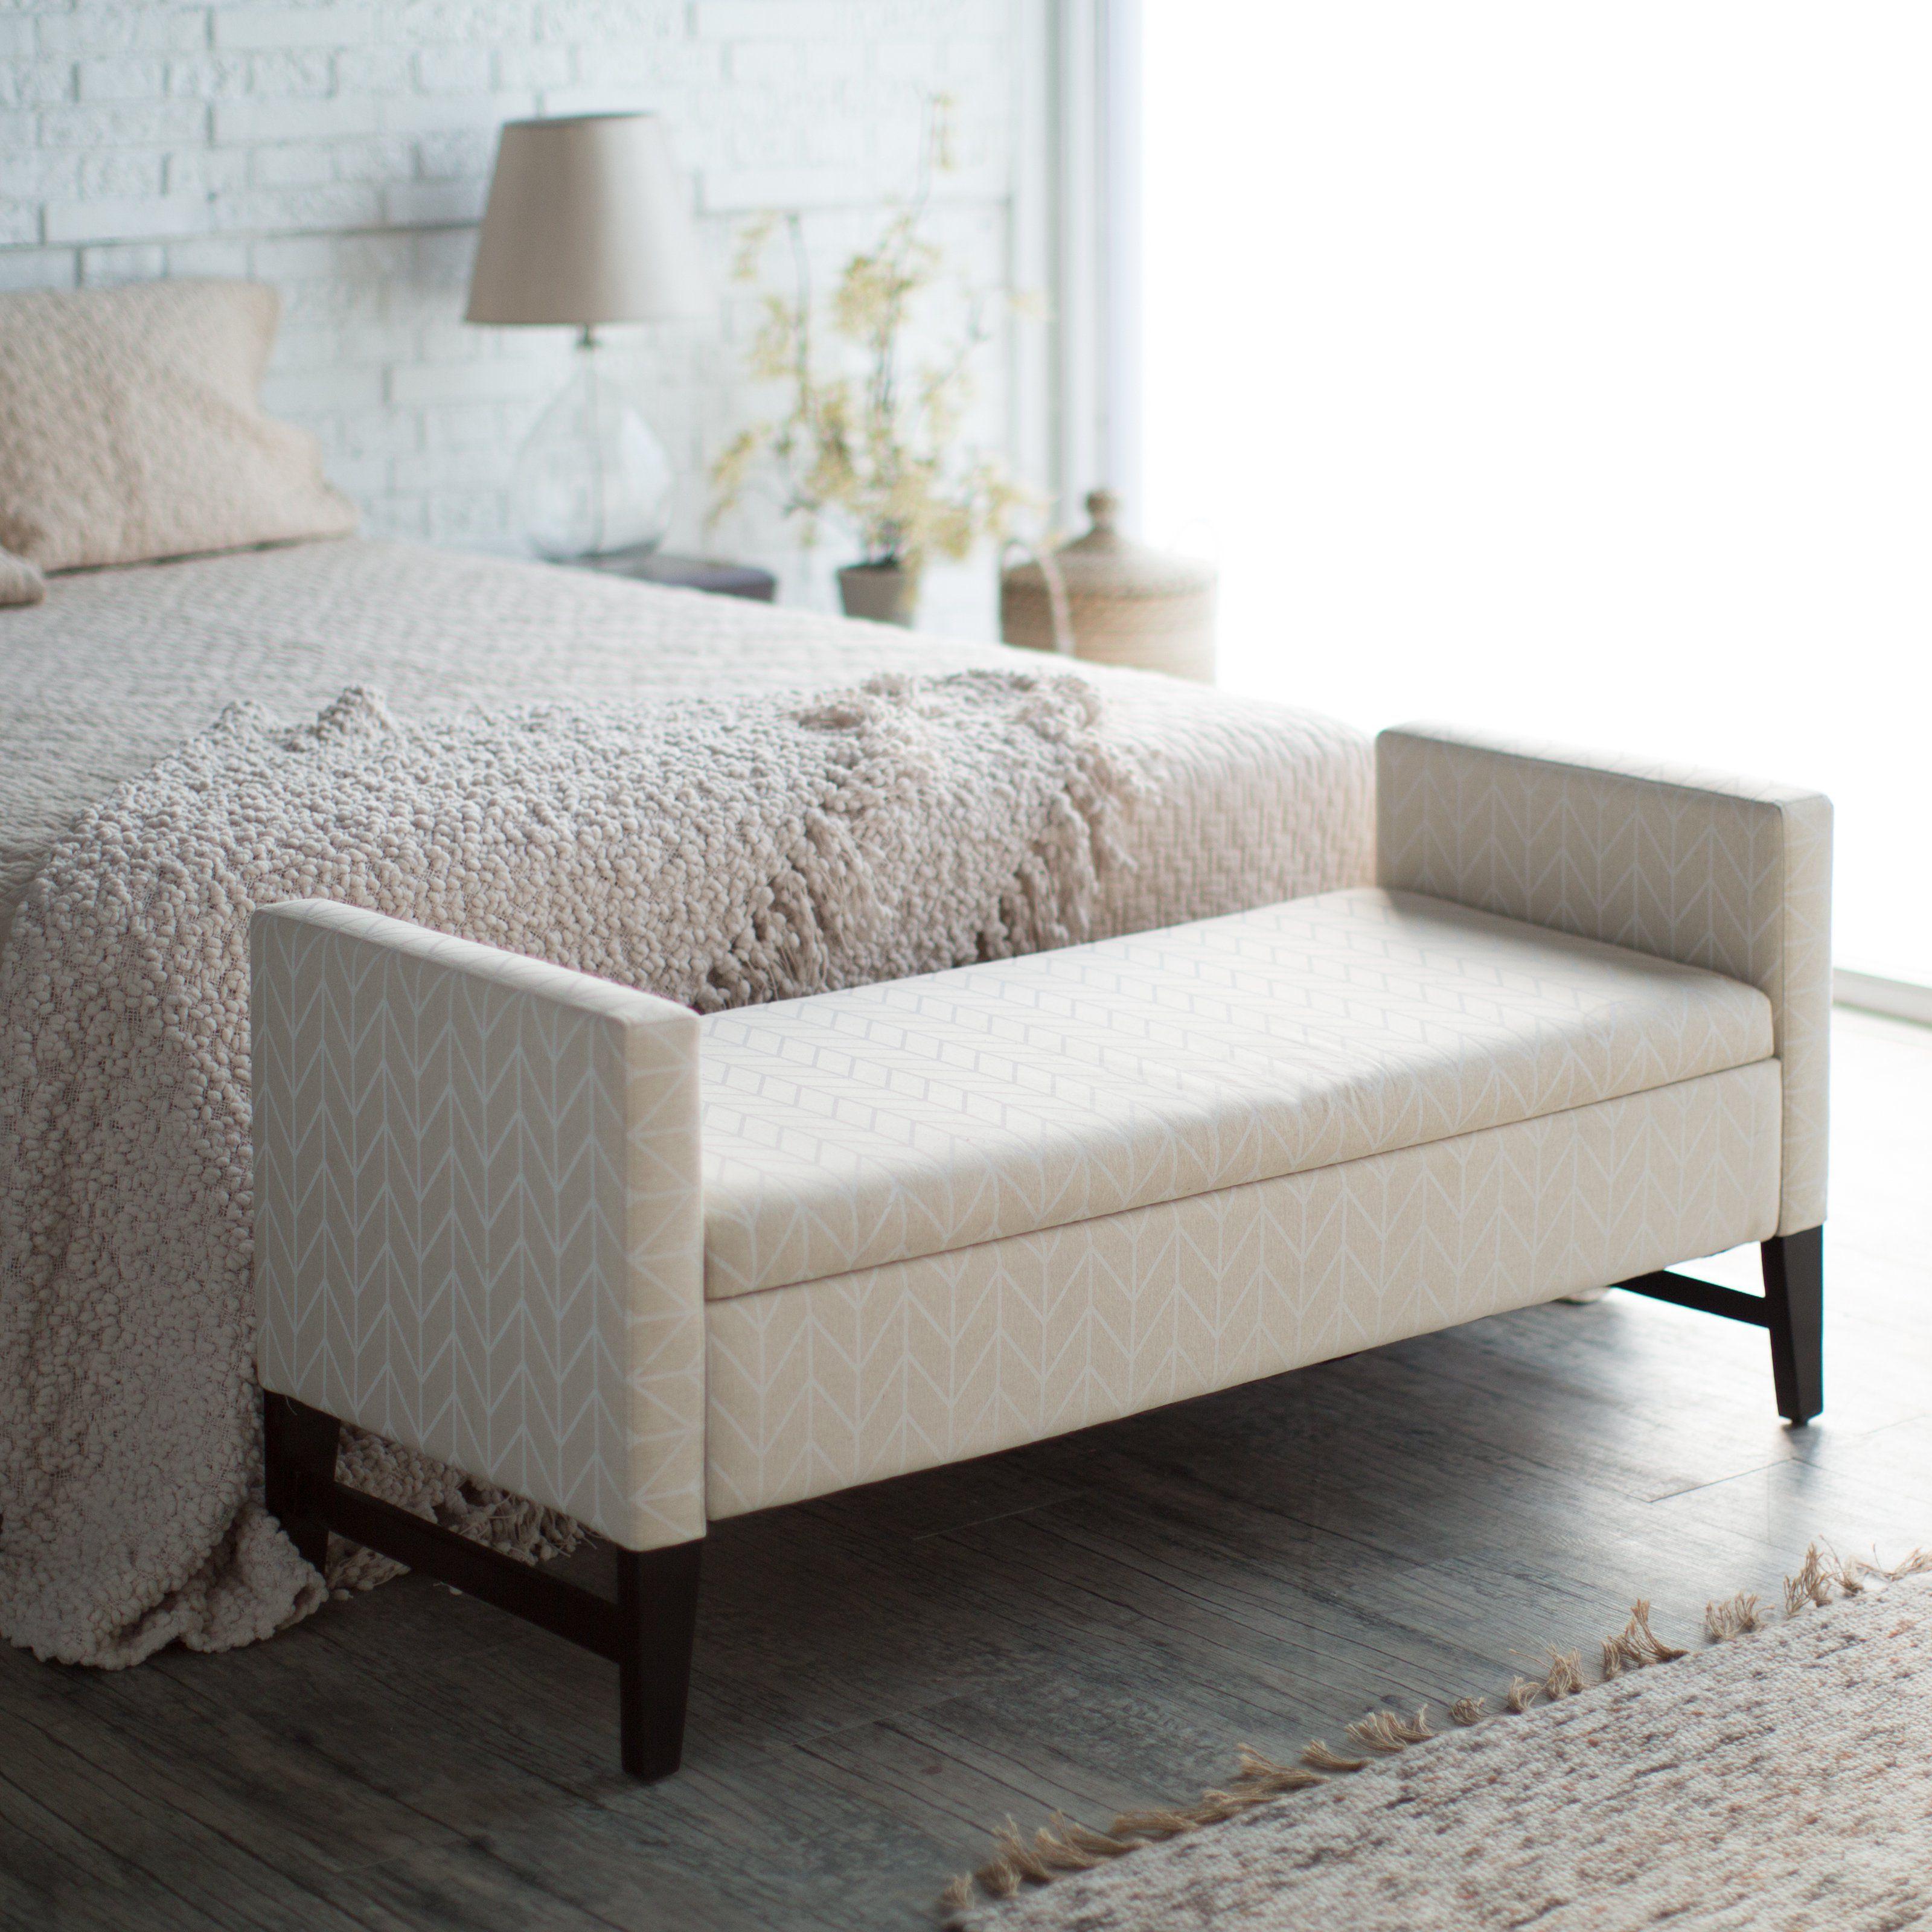 Belham Living Camille Upholstered Backless Storage Bench Neutral